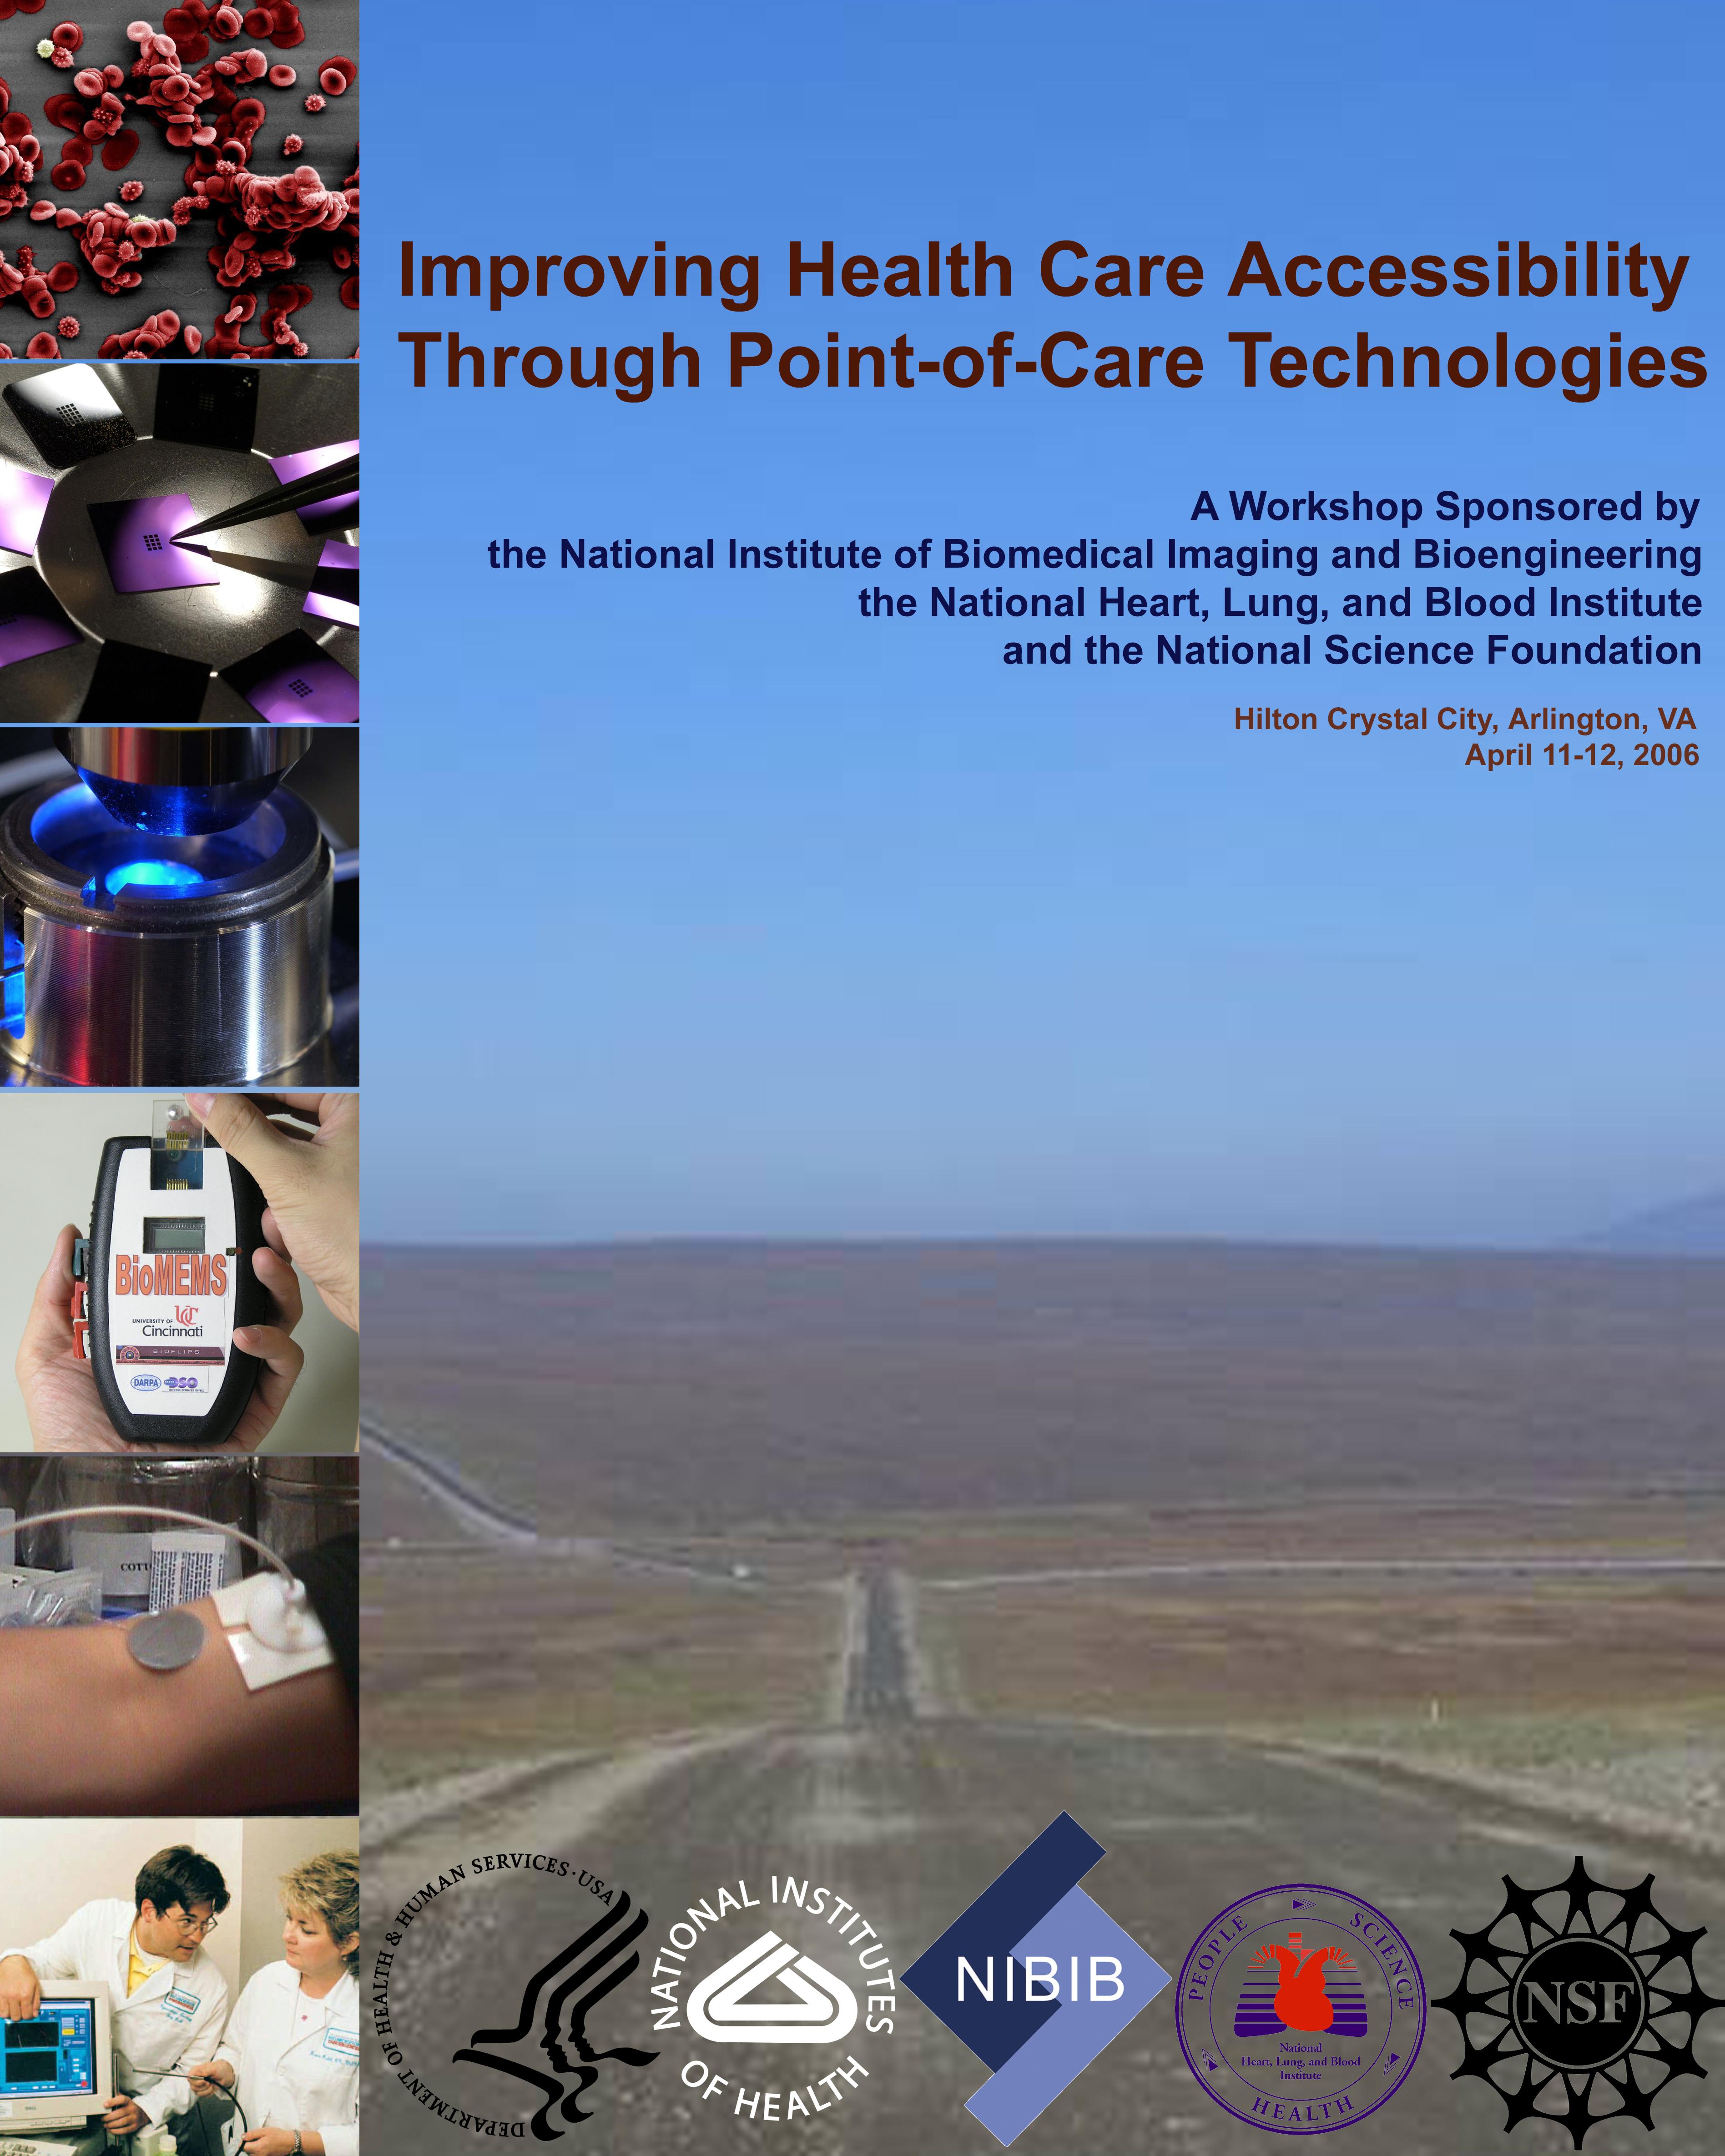 Sponsored by theNational Institute of Biomedical Imaging and Bioengineering (NIH)National Heart, Lung, and Blood Institute (NIH)National Science Foundation